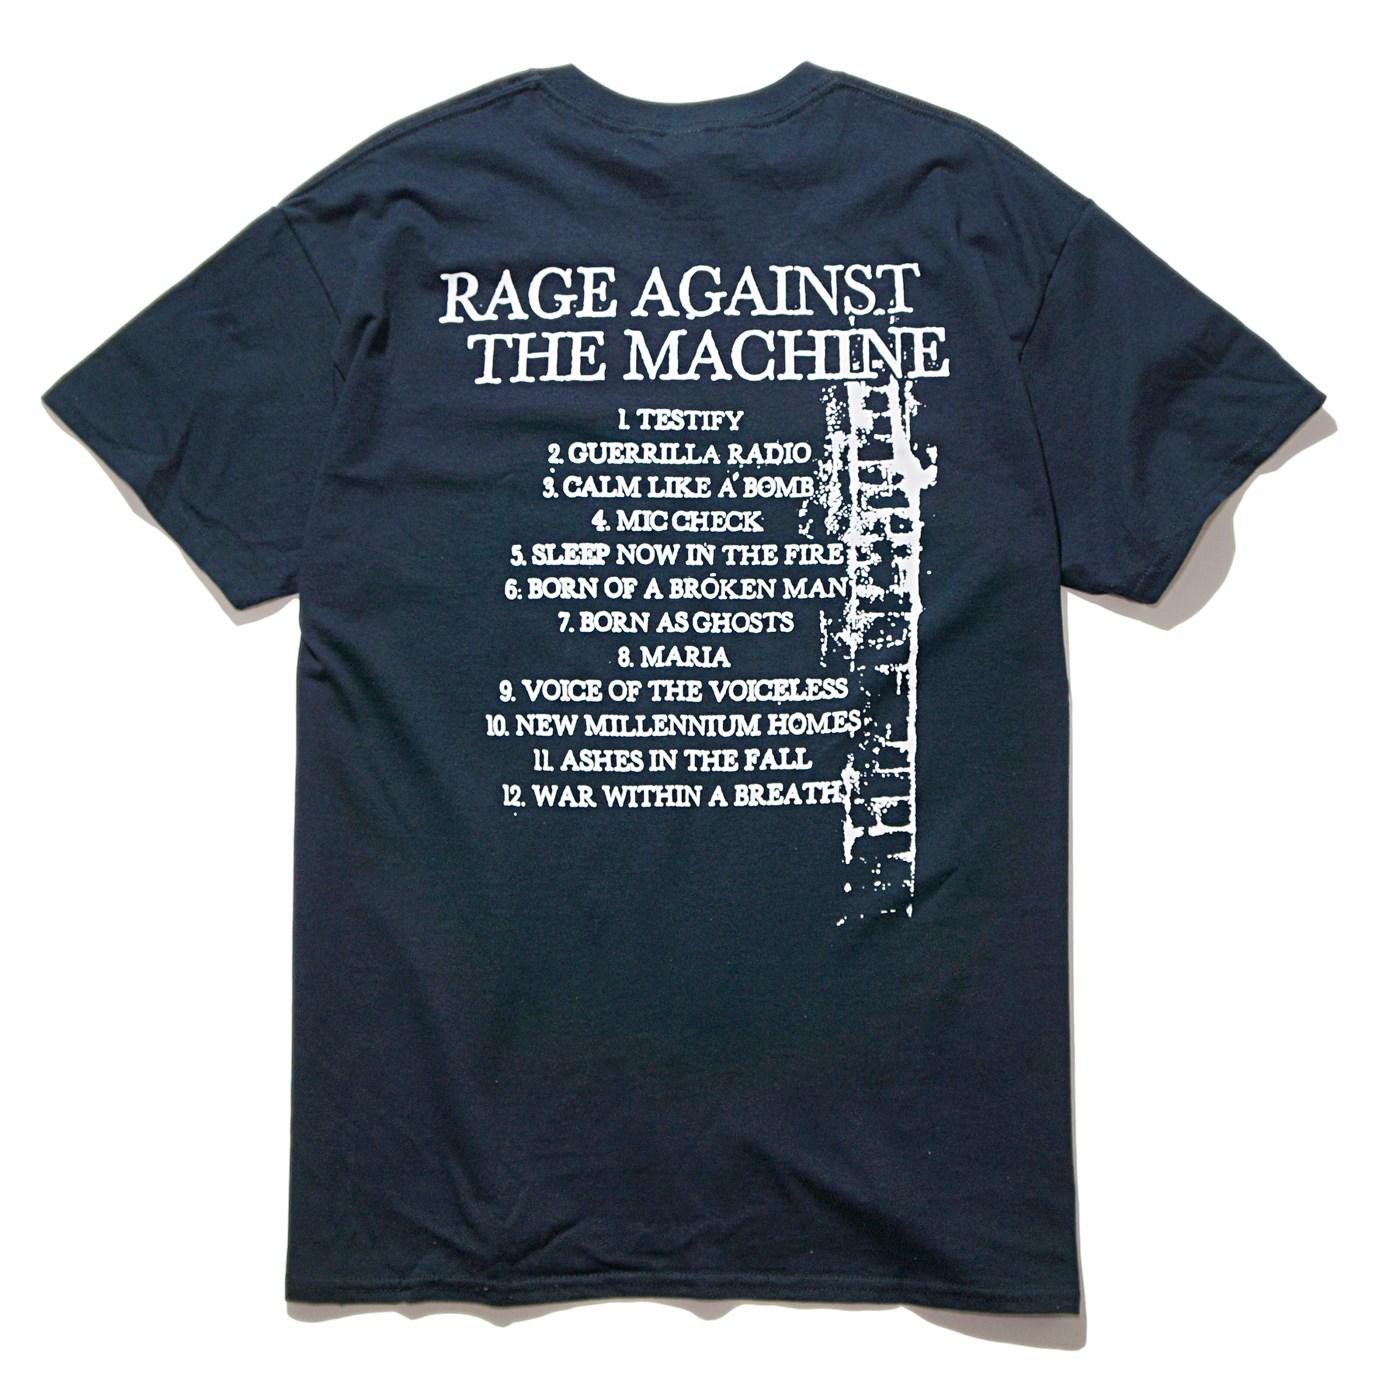 RAGE AGAINST THE MACHINE Tシャツ Bola Album Cover Trucks-Black